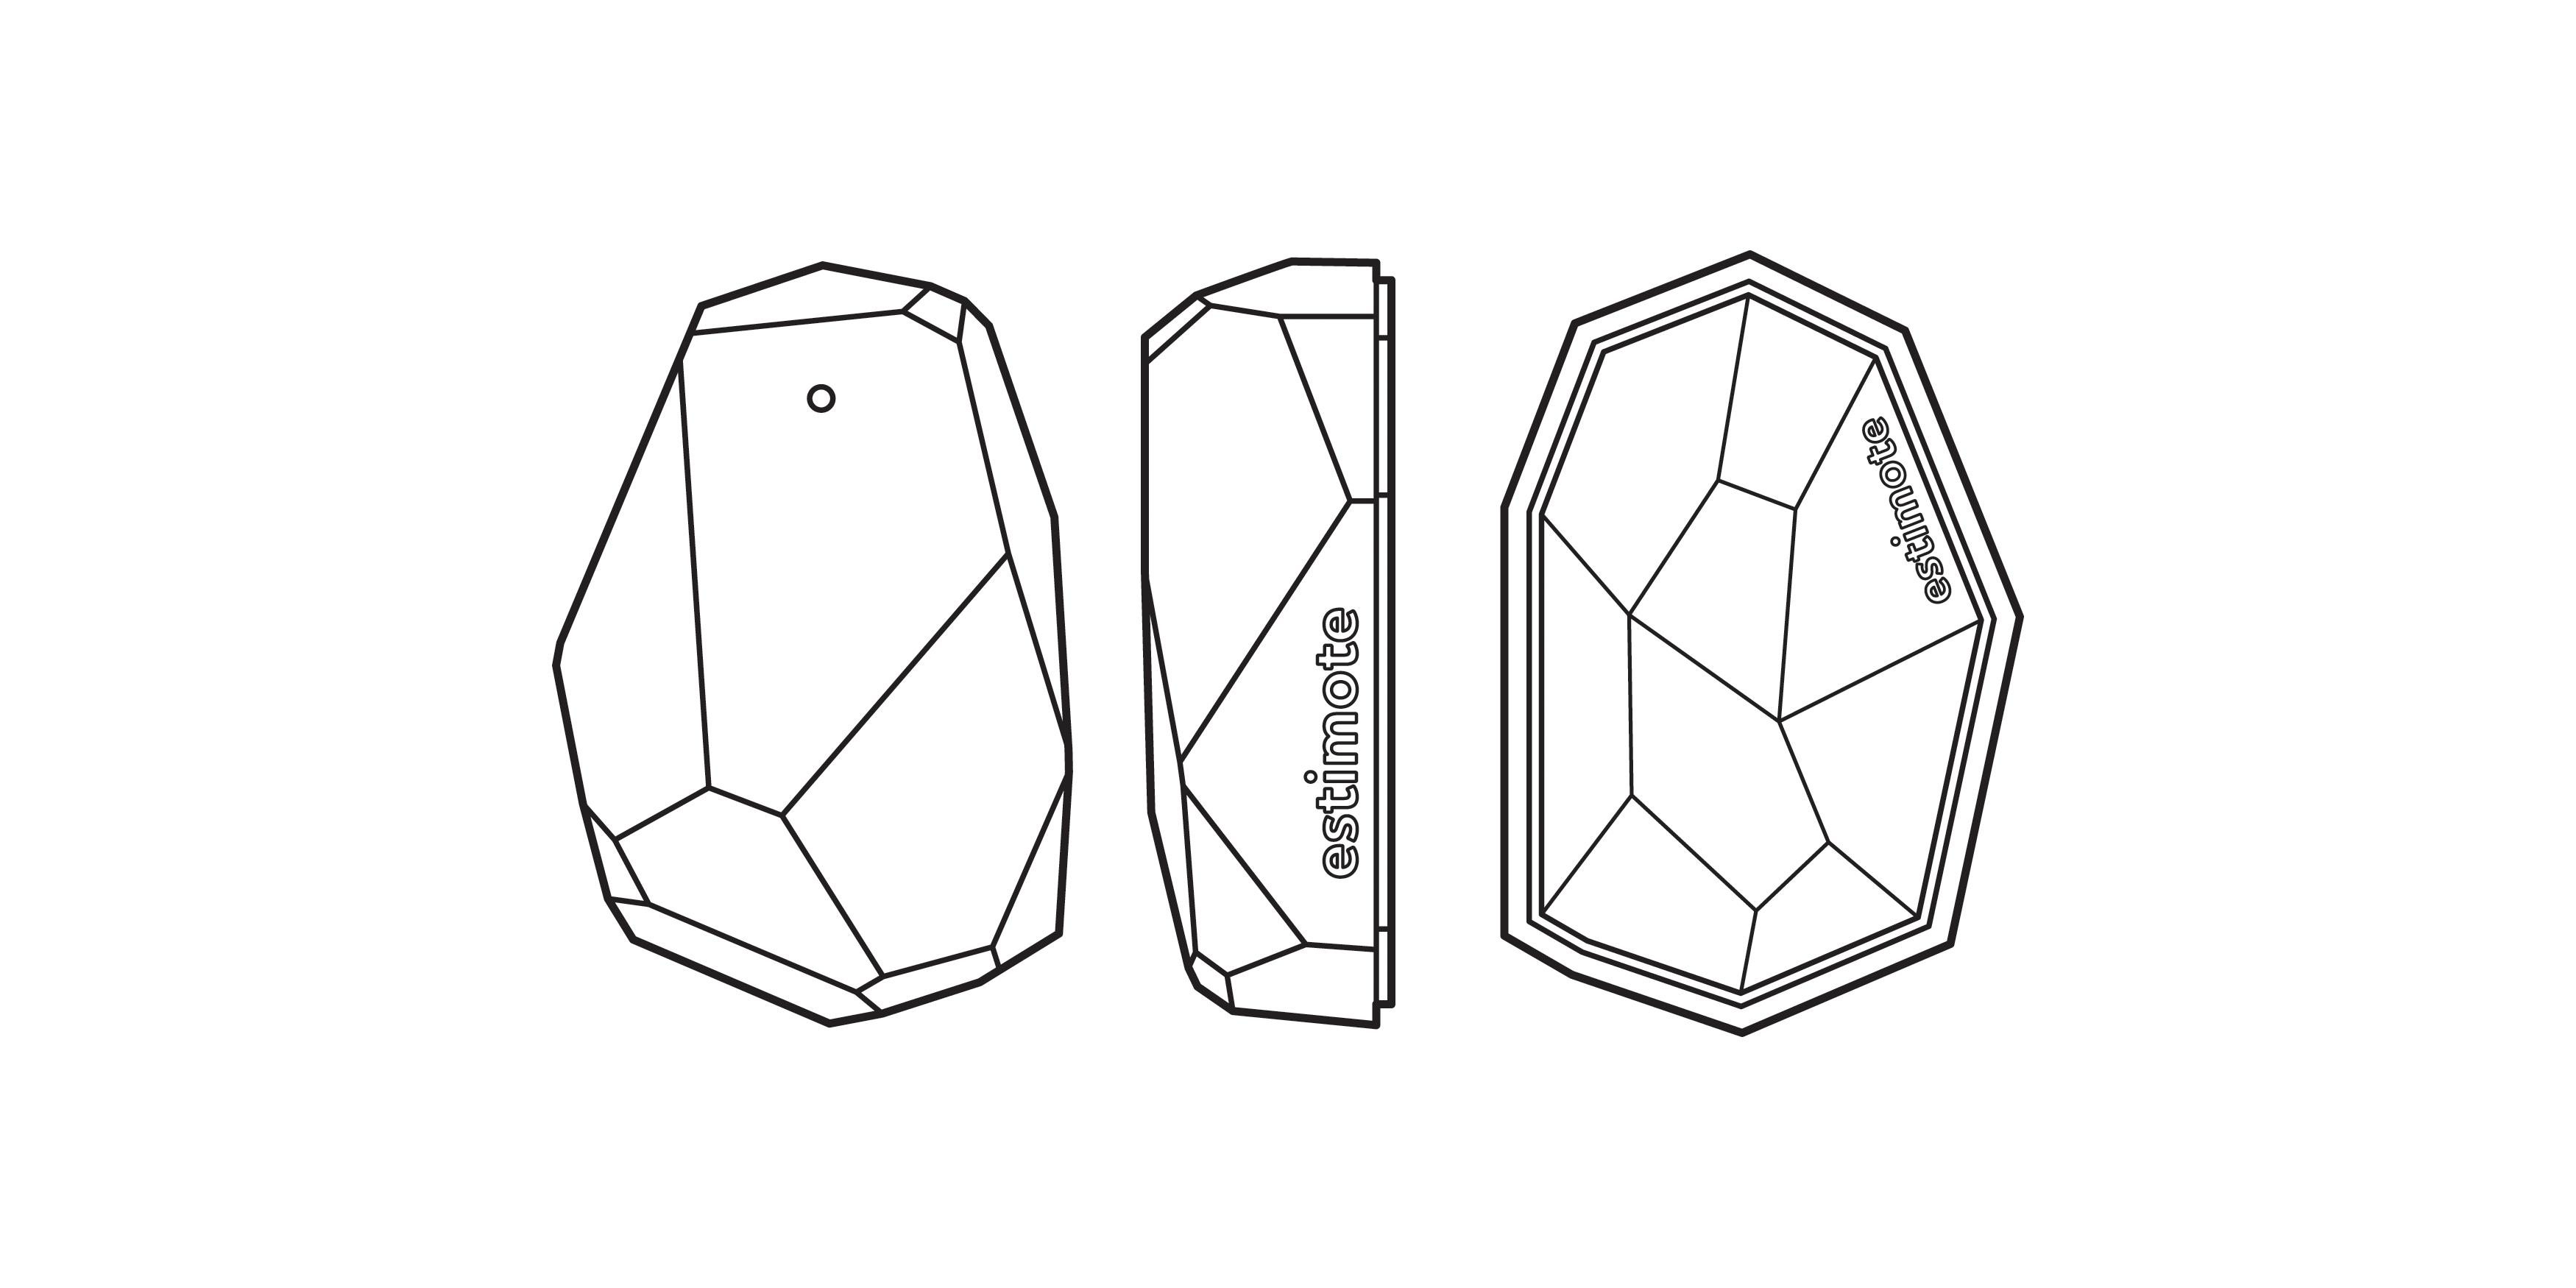 press-beacon-illustration-1.7b4c5278